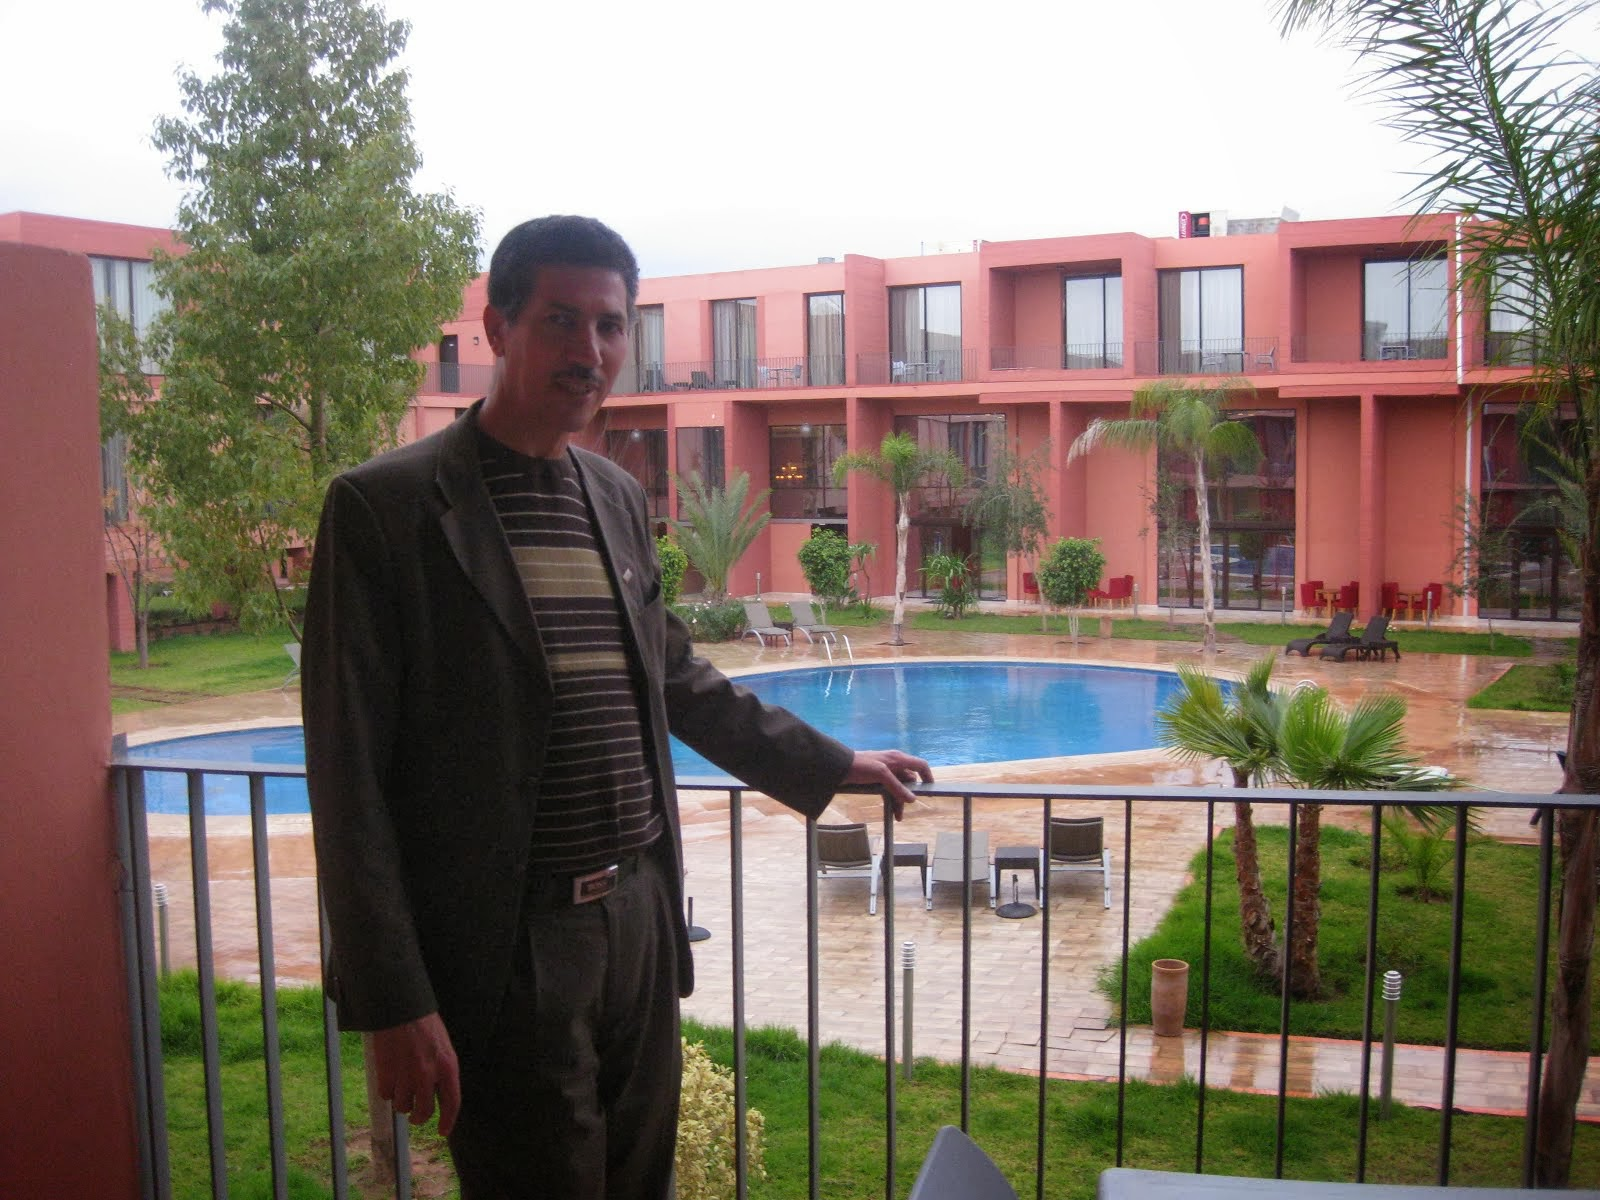 MED ELHATIMI HOTEL GOLDIN TULIB RAWABI A MARRAKECH AU CONGRE D ARTHROSCOPIE